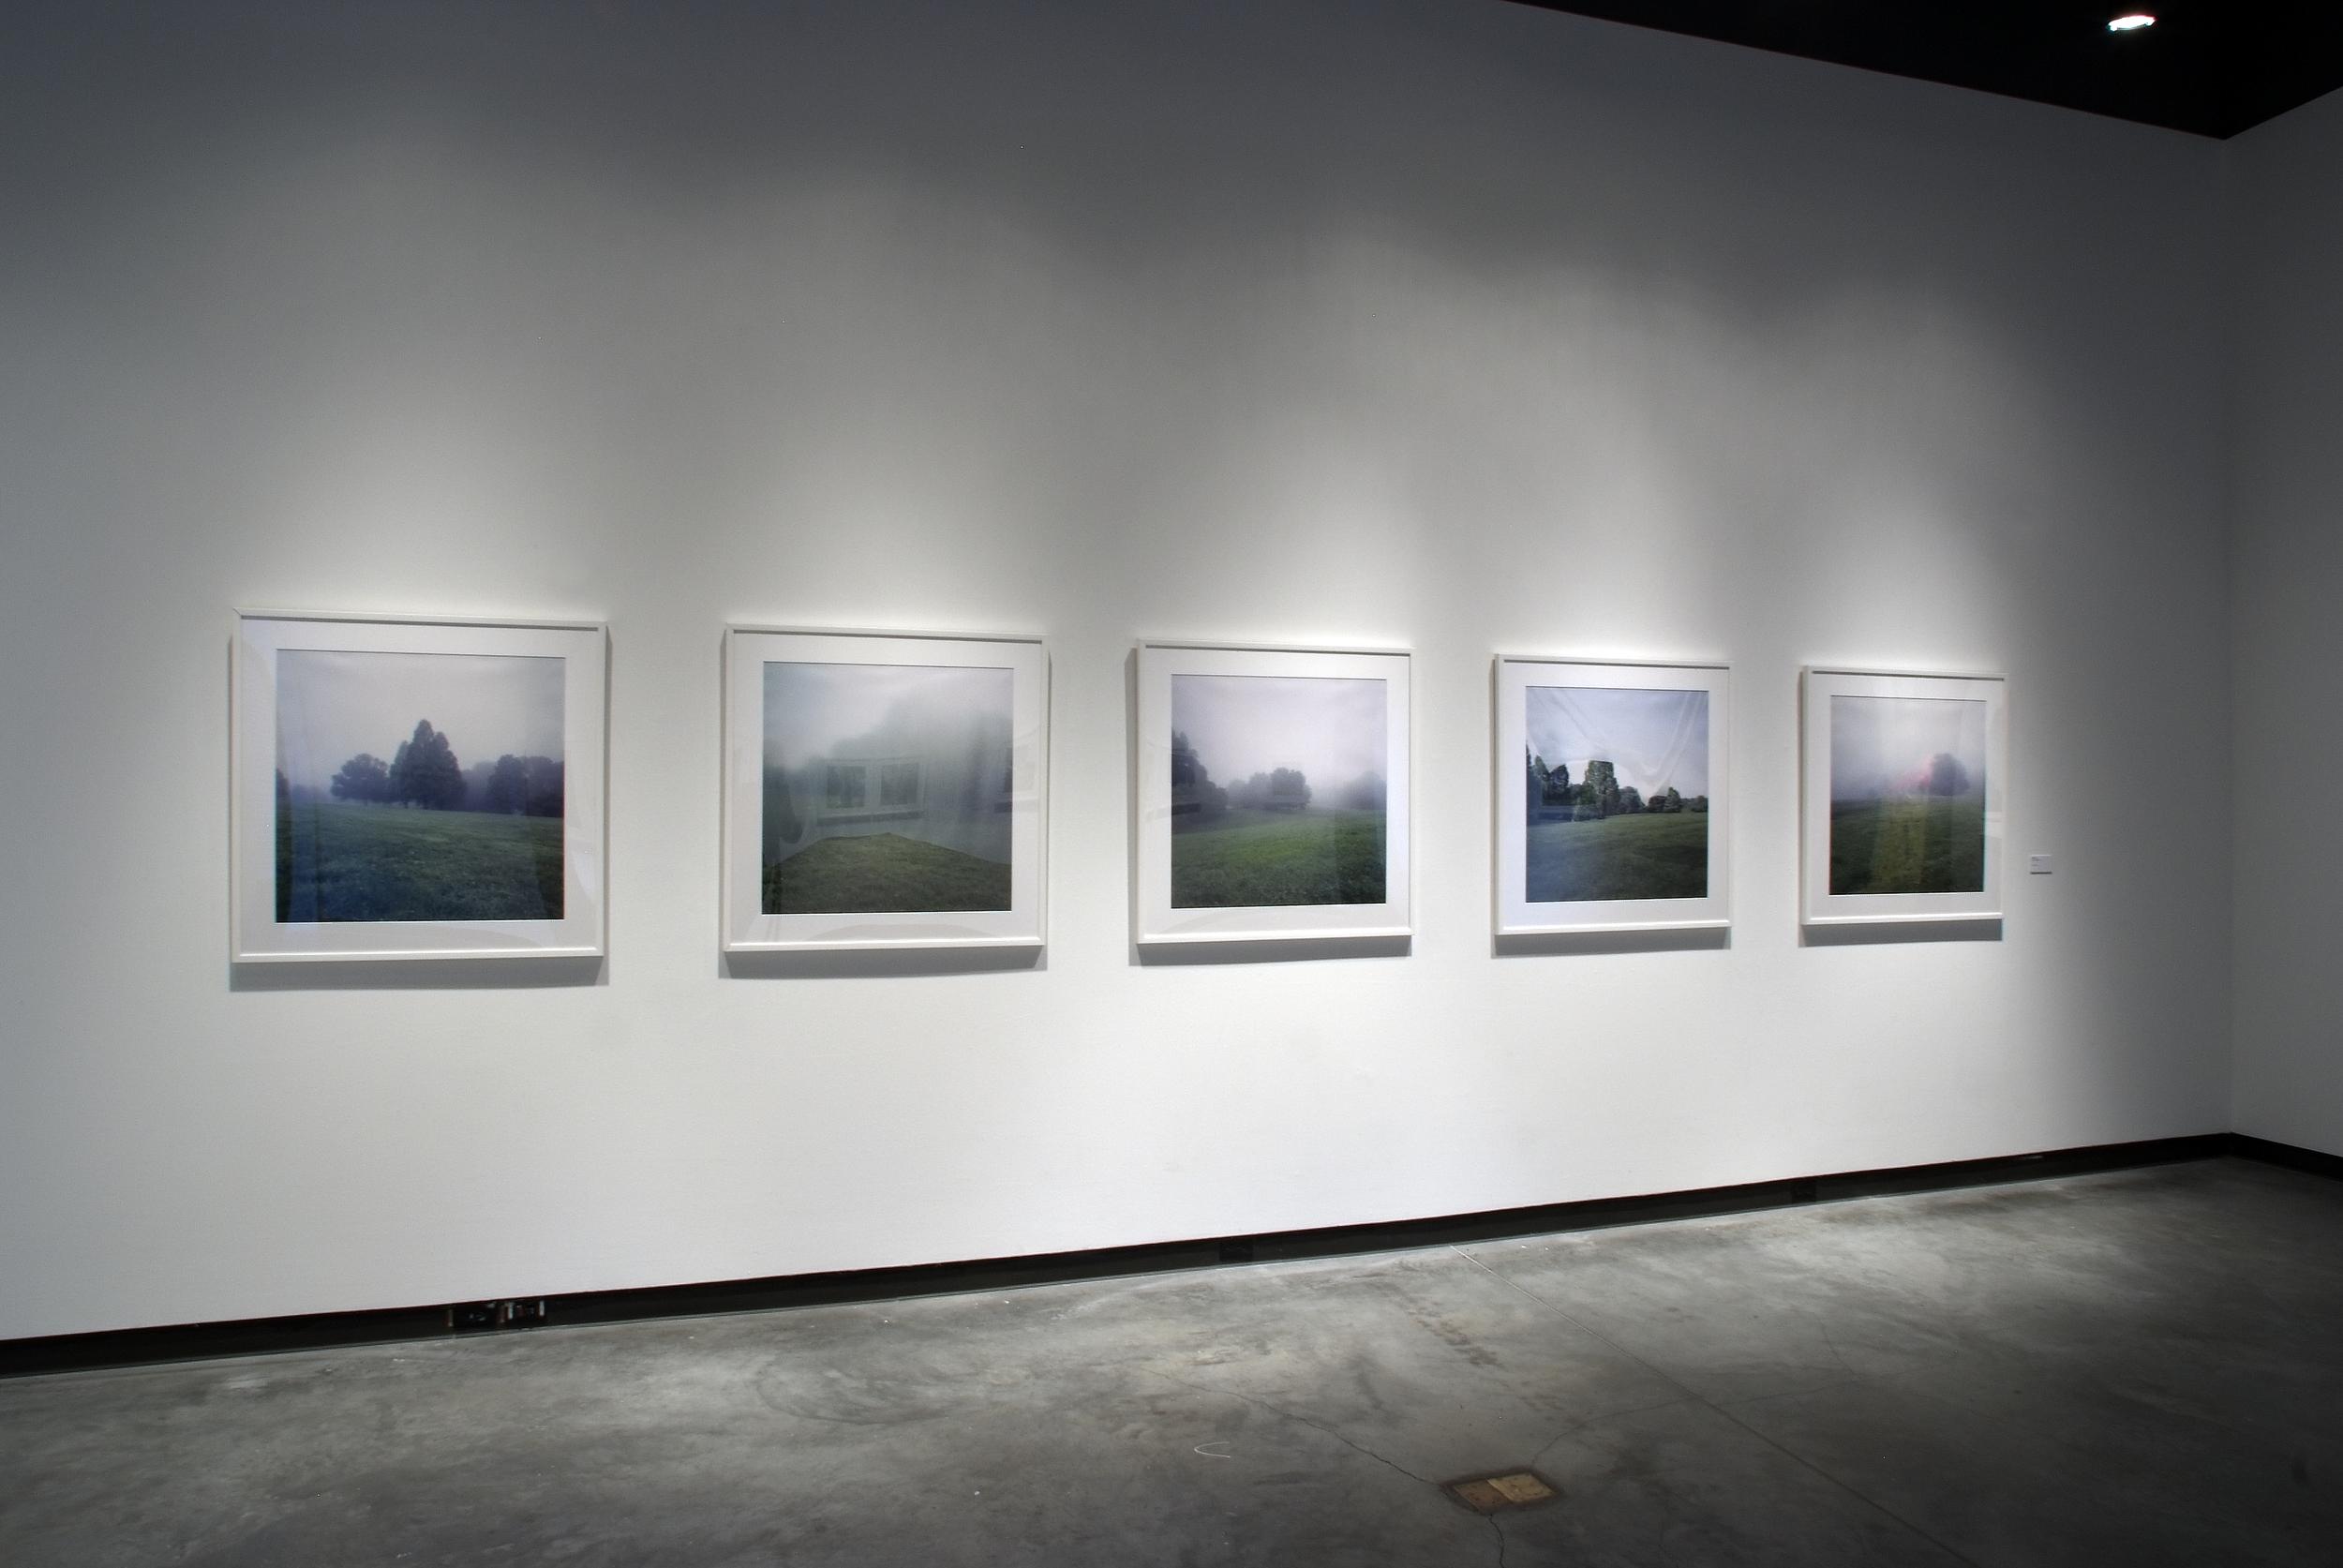 Keith Sharp Delaware Center for the Contemporary Arts, Wilmington, DE